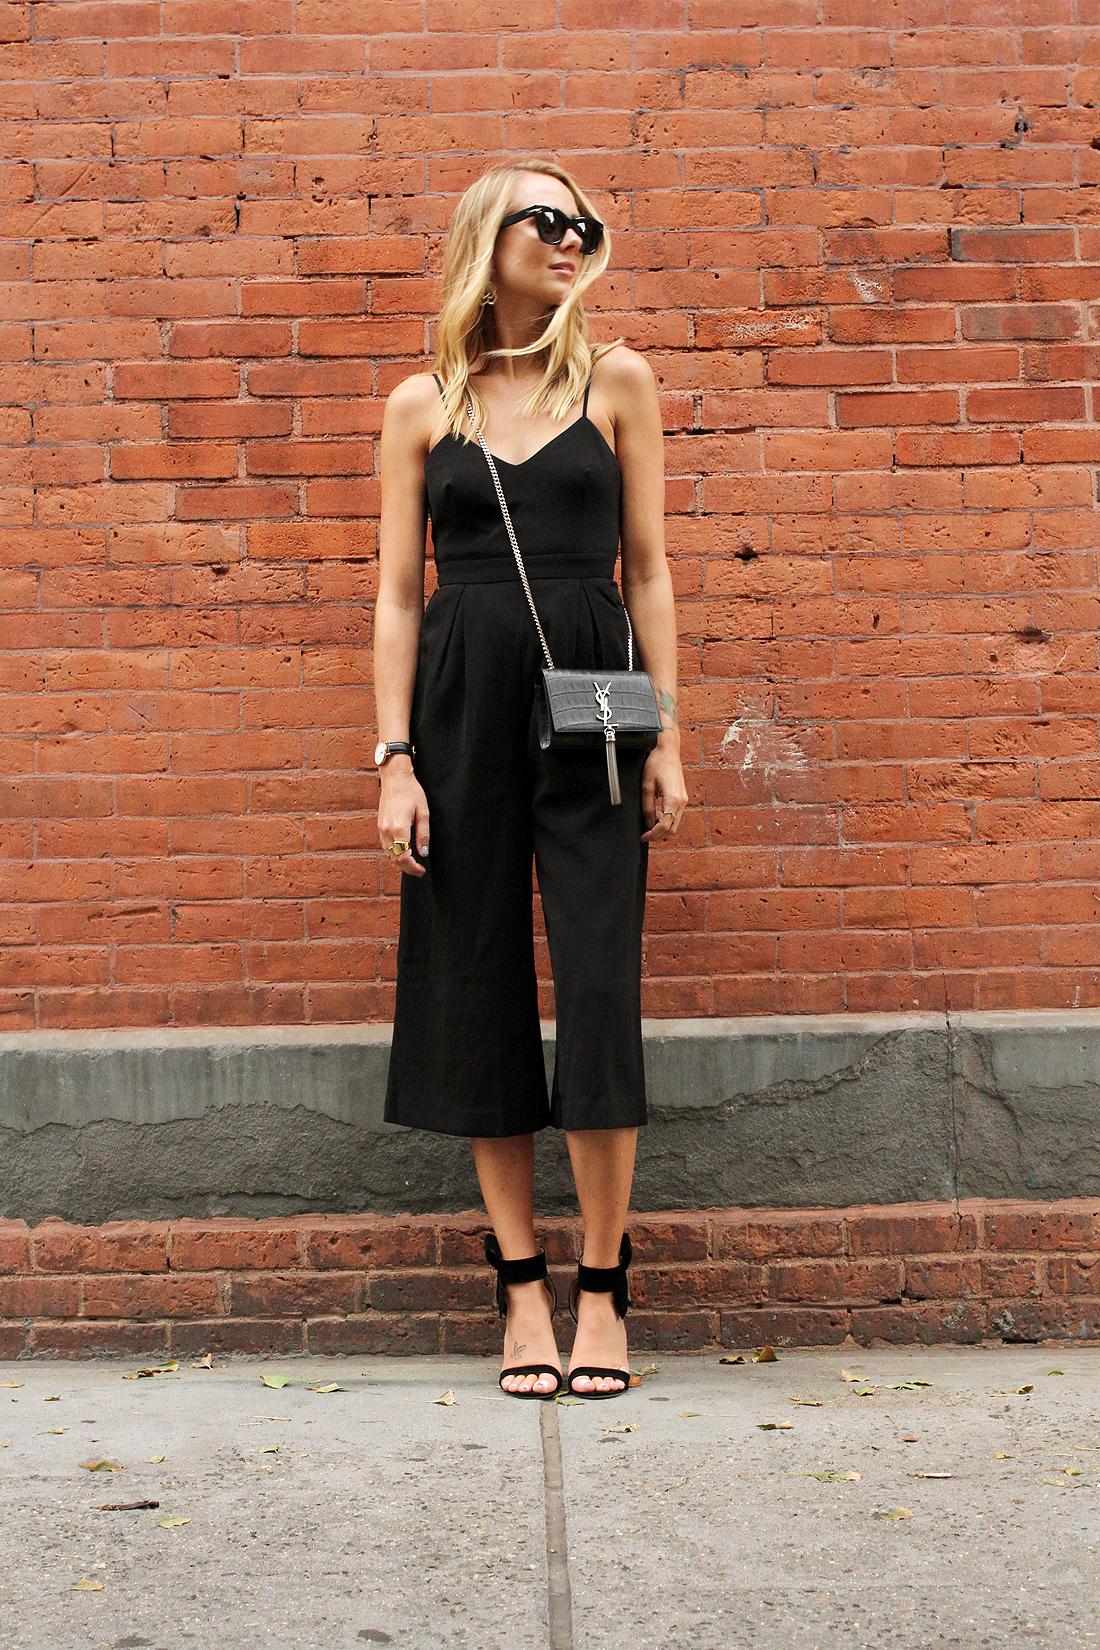 fashion-jackson-cameo-power-trip-jumpsuit-saint-laurent-cassandre-crossbody-handbag-black-bow-heels-black-celine-sunglasses-street-style-nyfw